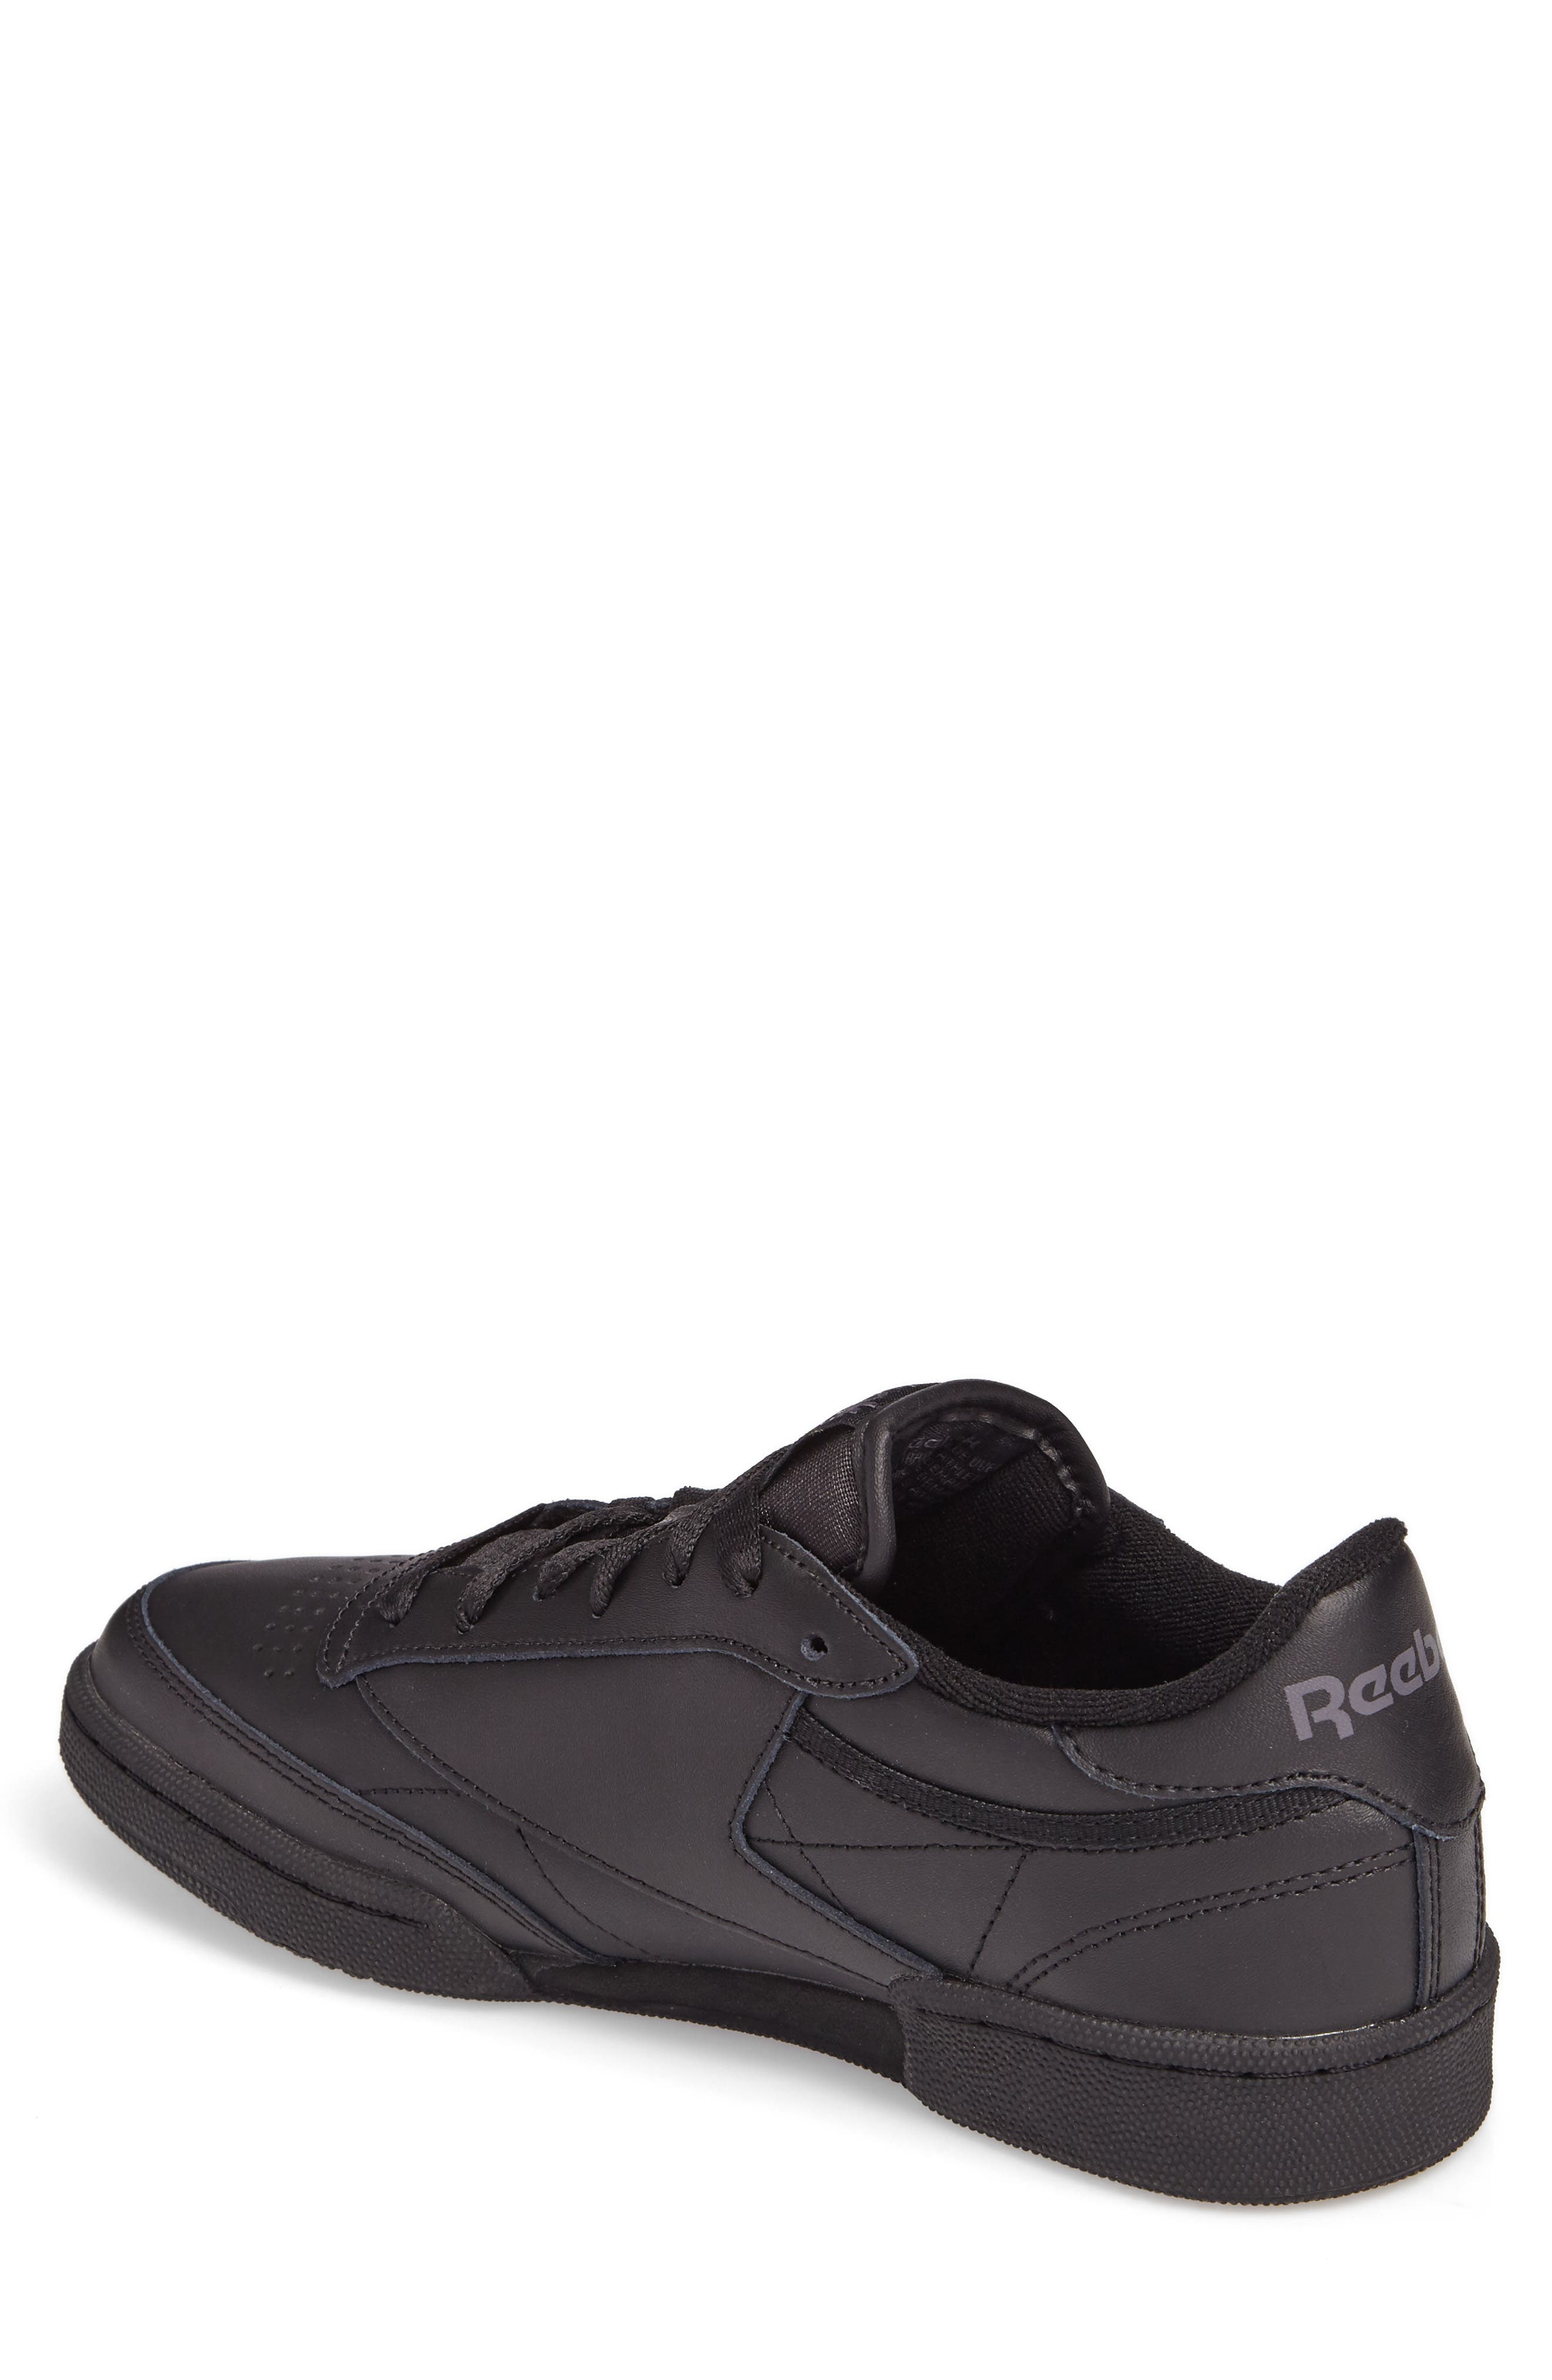 Club C 85 Sneaker,                             Alternate thumbnail 2, color,                             BLACK/ CHARCOAL